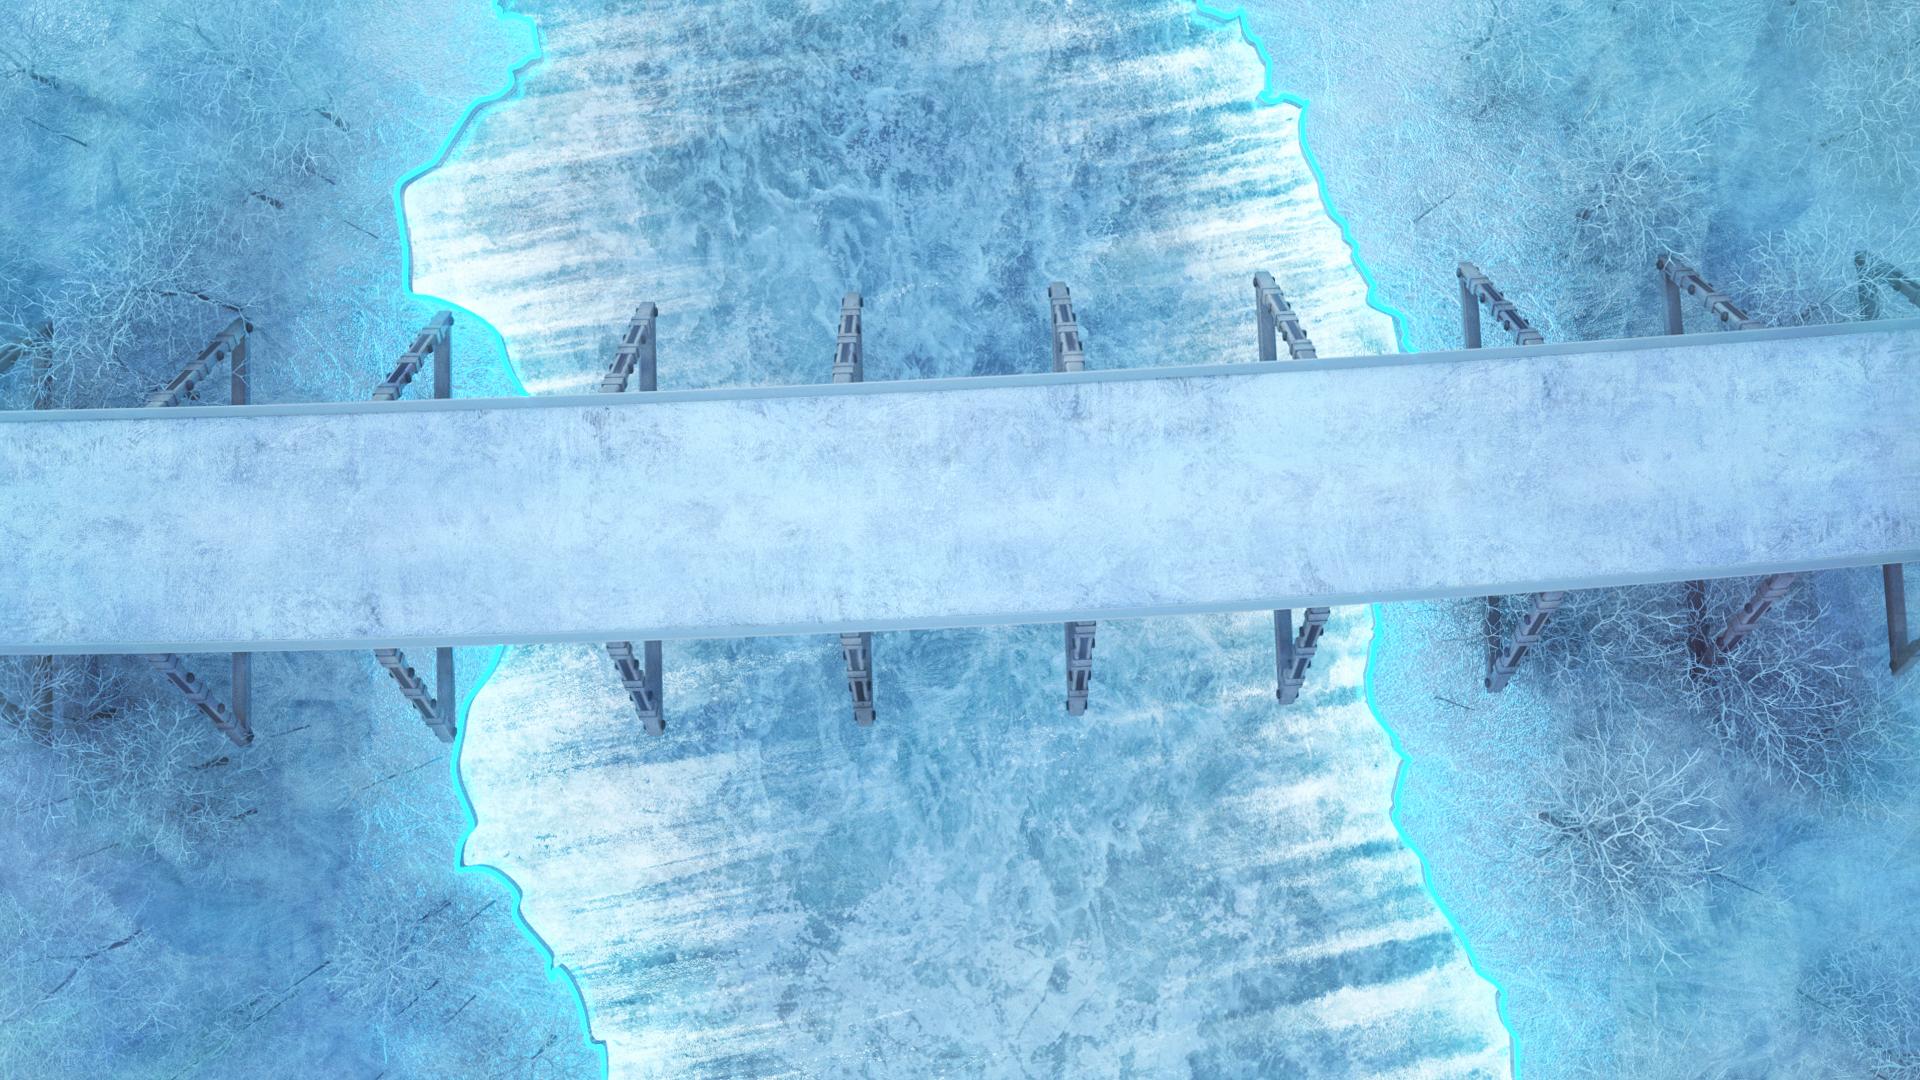 General 1920x1080 cold winter ice frozen river frozen water floating particles cracked trees neon neon glow road bridge concrete grunge pillar digital art 3D graphics cyan